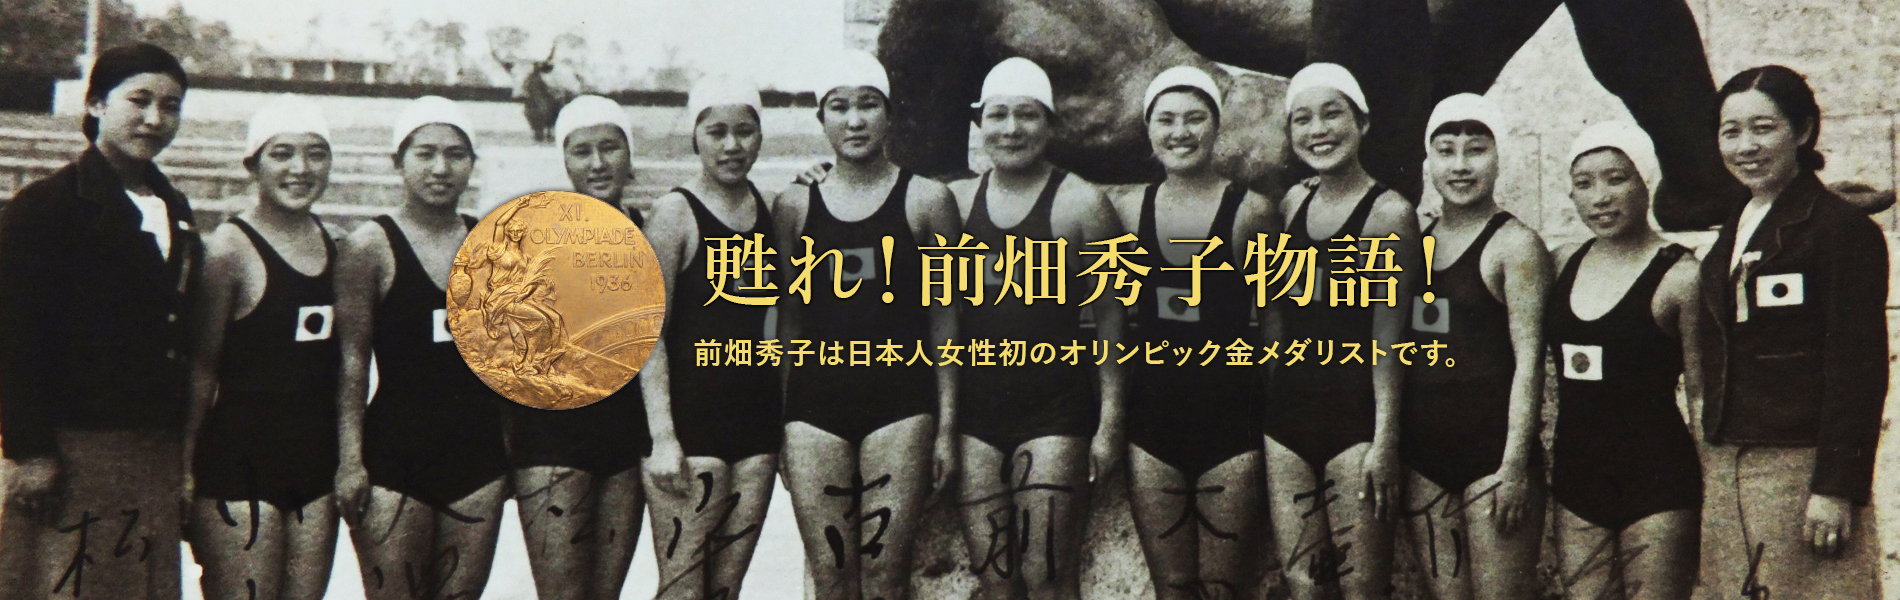 前畑秀子の画像 p1_29